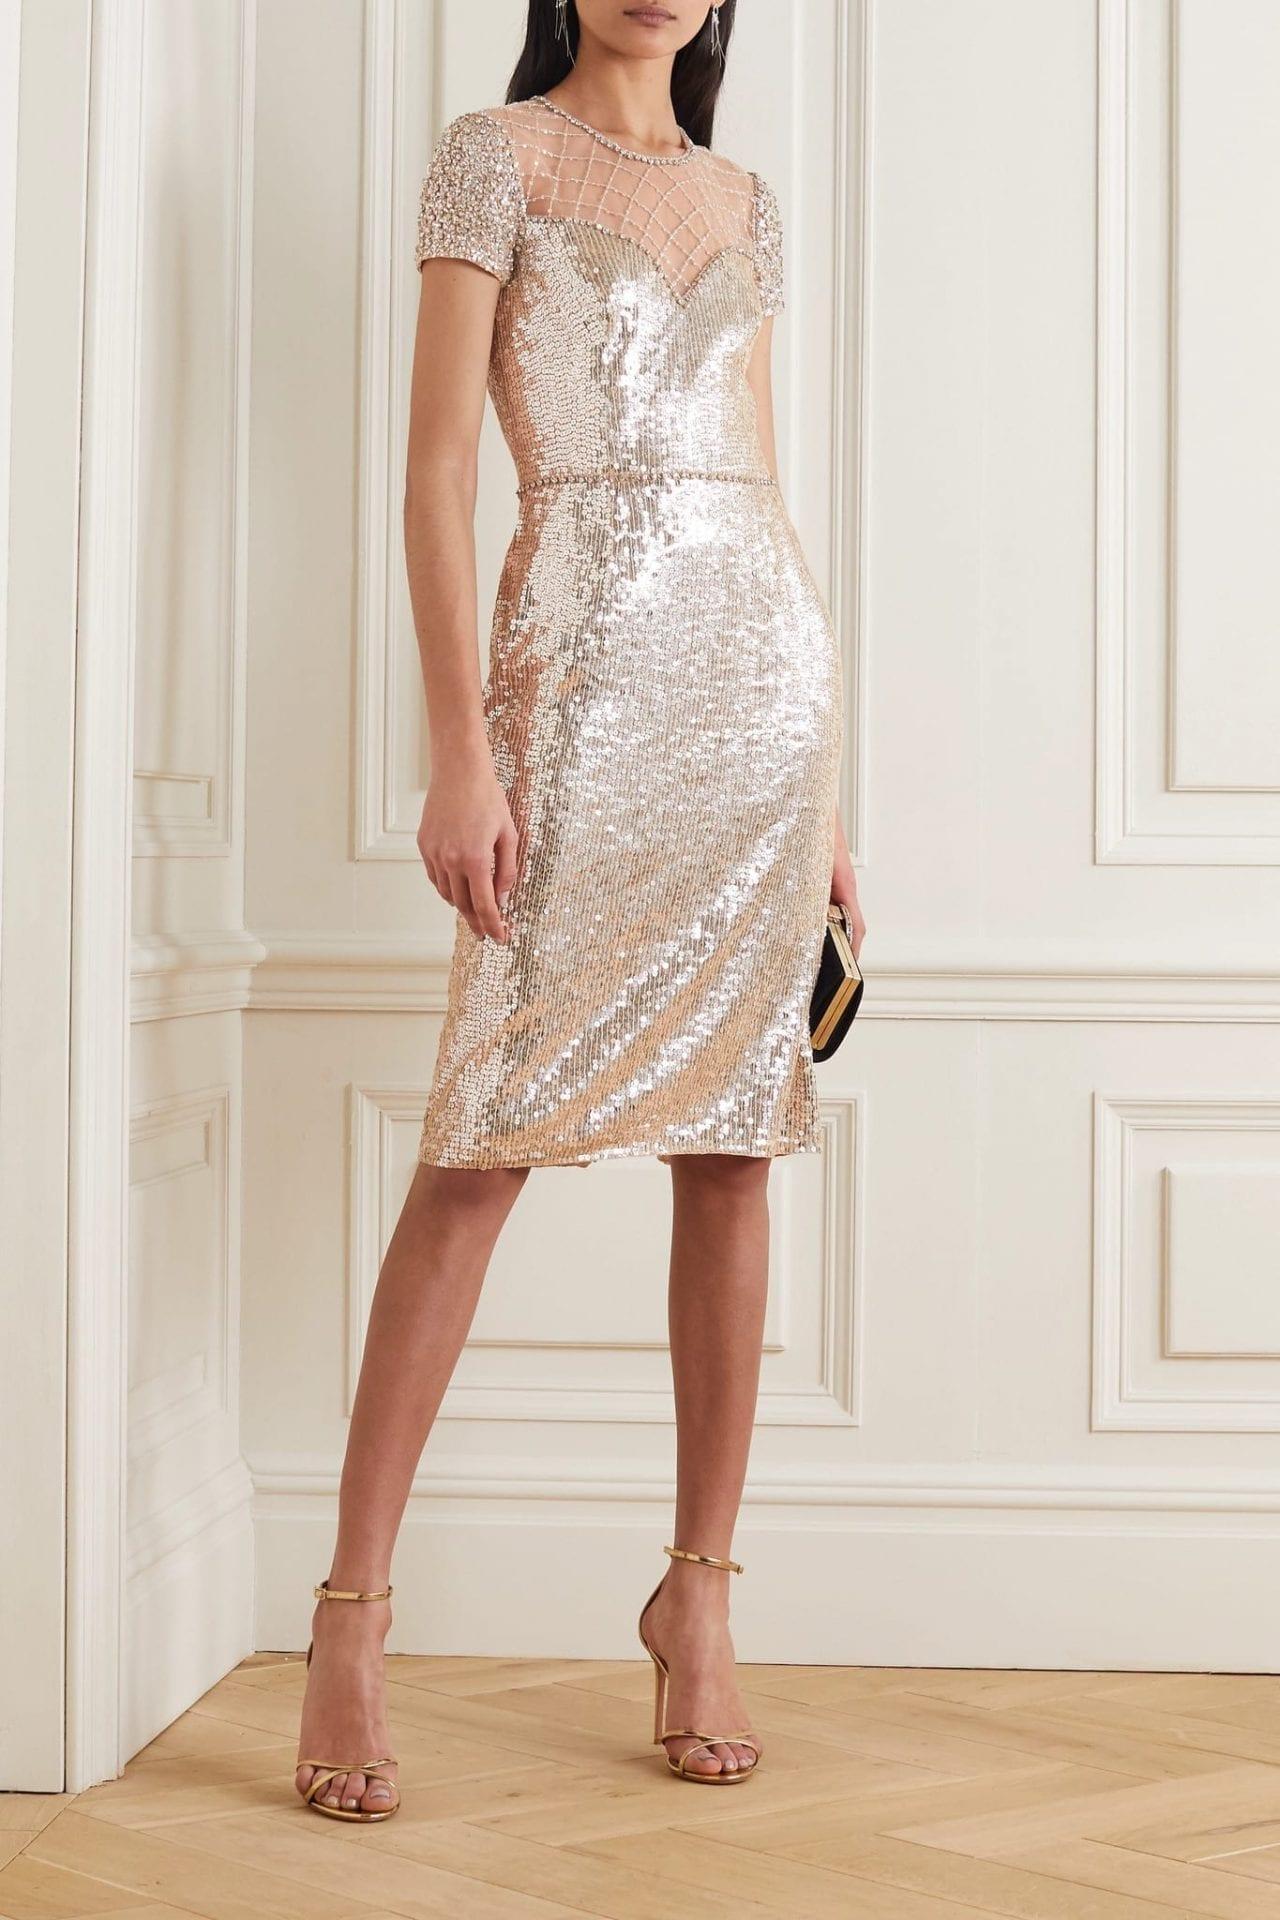 JENNY PACKHAM Delphine Embellished Sequined Tulle Dress